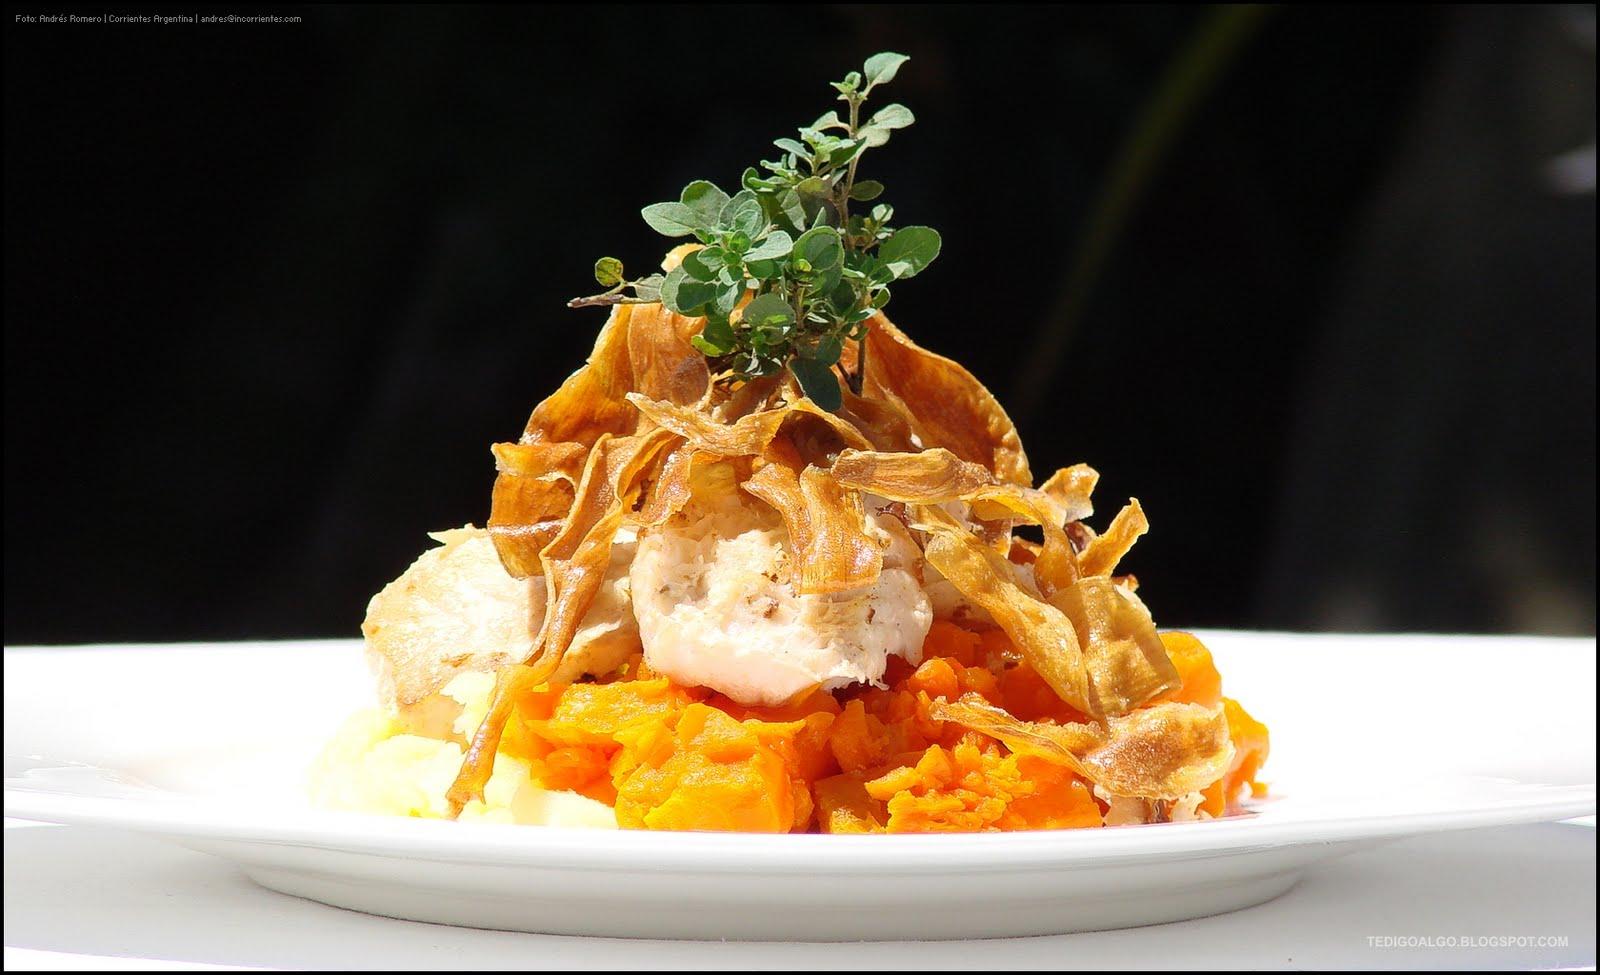 6732comida Alfonzo Cocina Gourmet 1470266 Hd Wallpaper